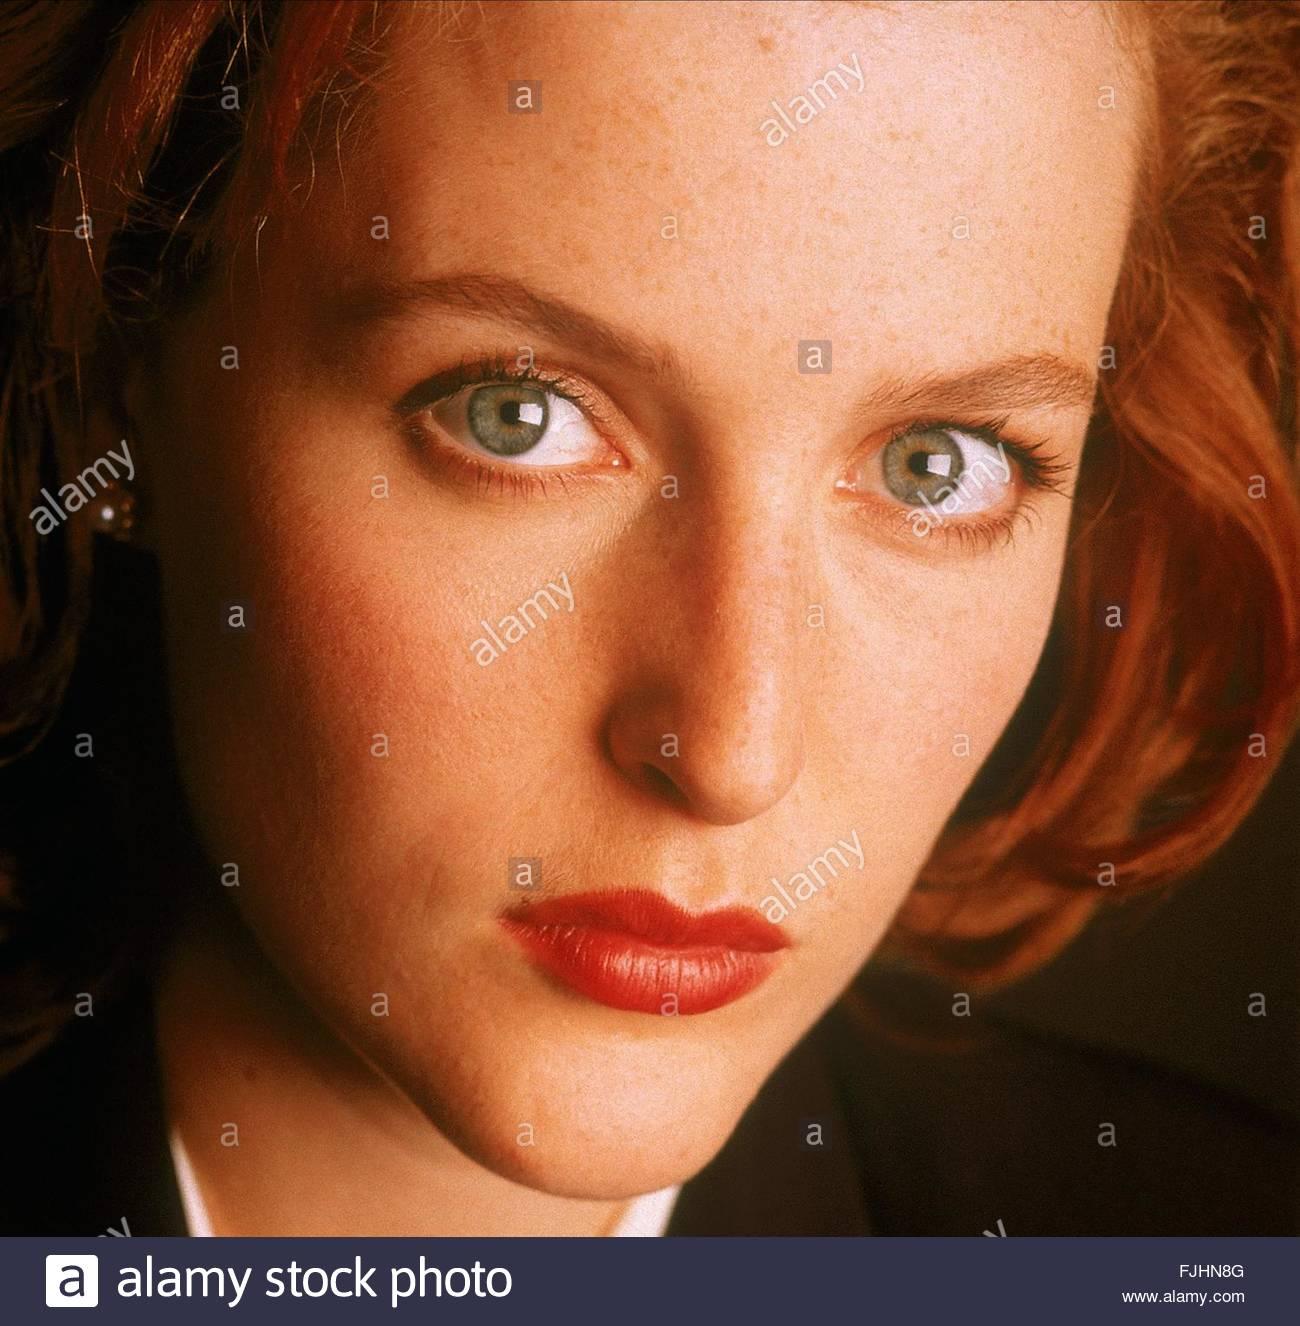 GILLIAN ANDERSON THE X FILES (1993) - Stock Image